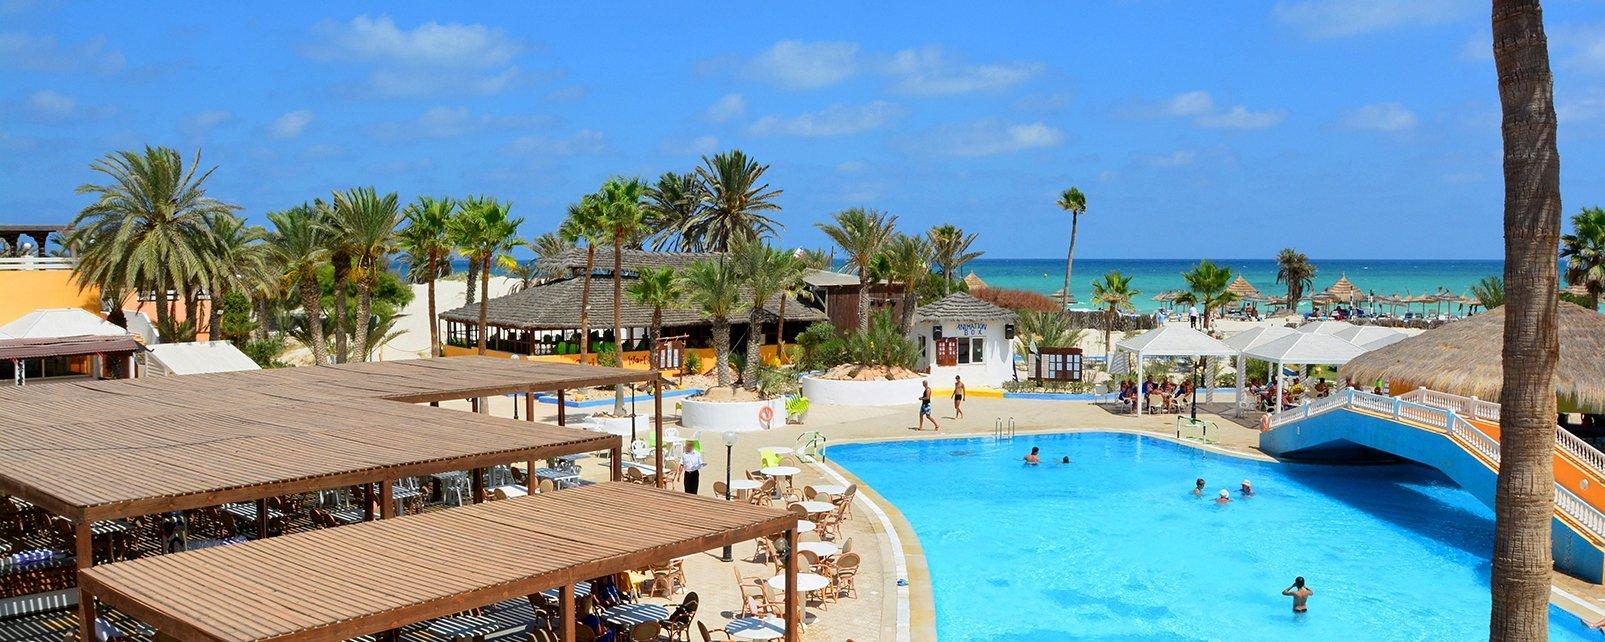 Hotel club look a playa djerba in djerba tunisia for Hotels djerba